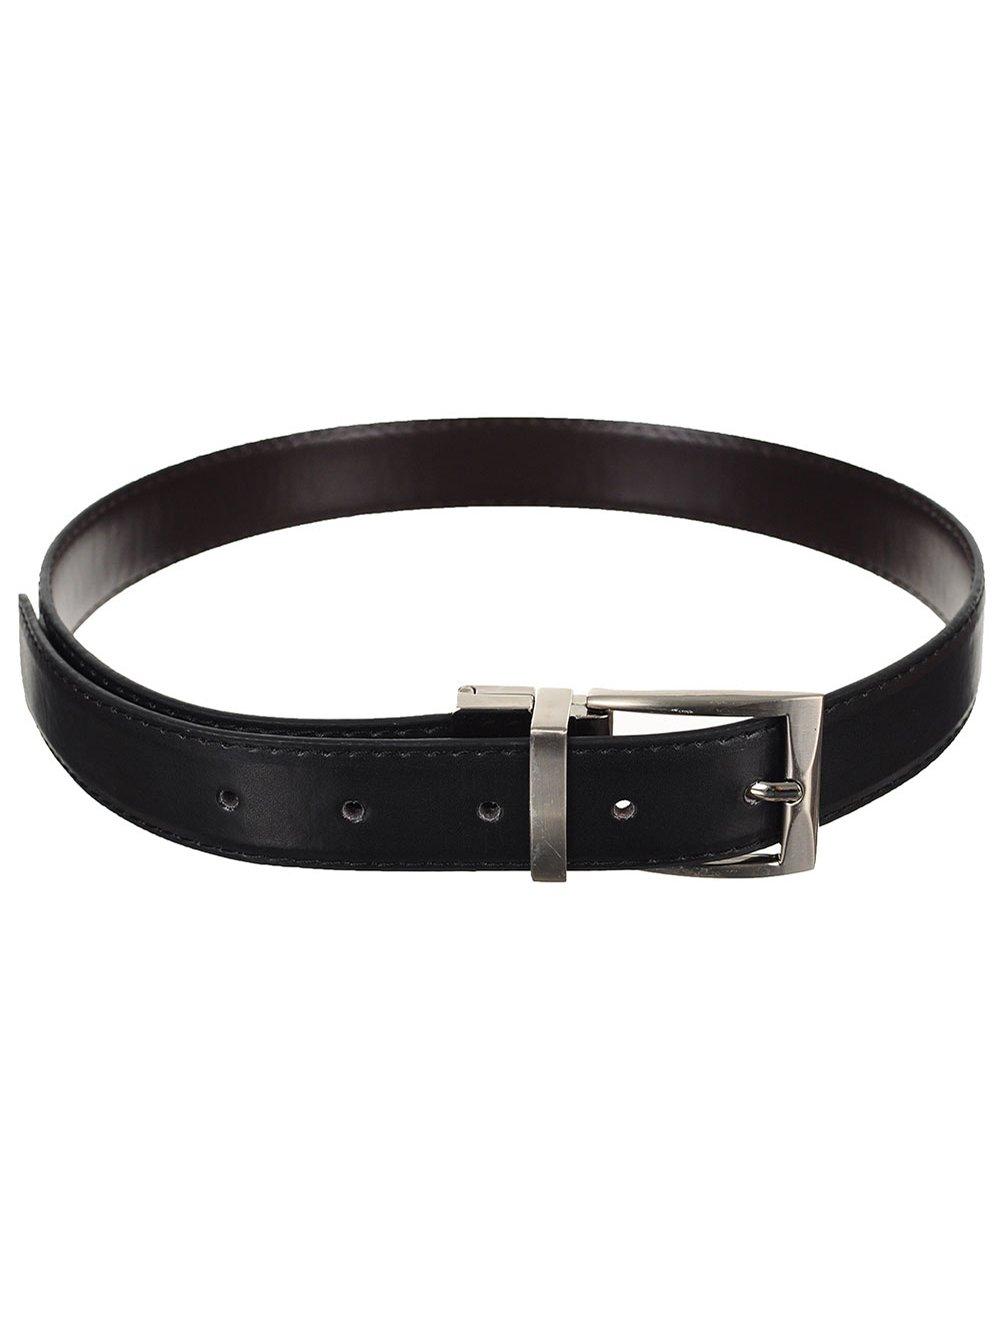 Ron Chereskin Leather Belt - black/brown, 26' 26